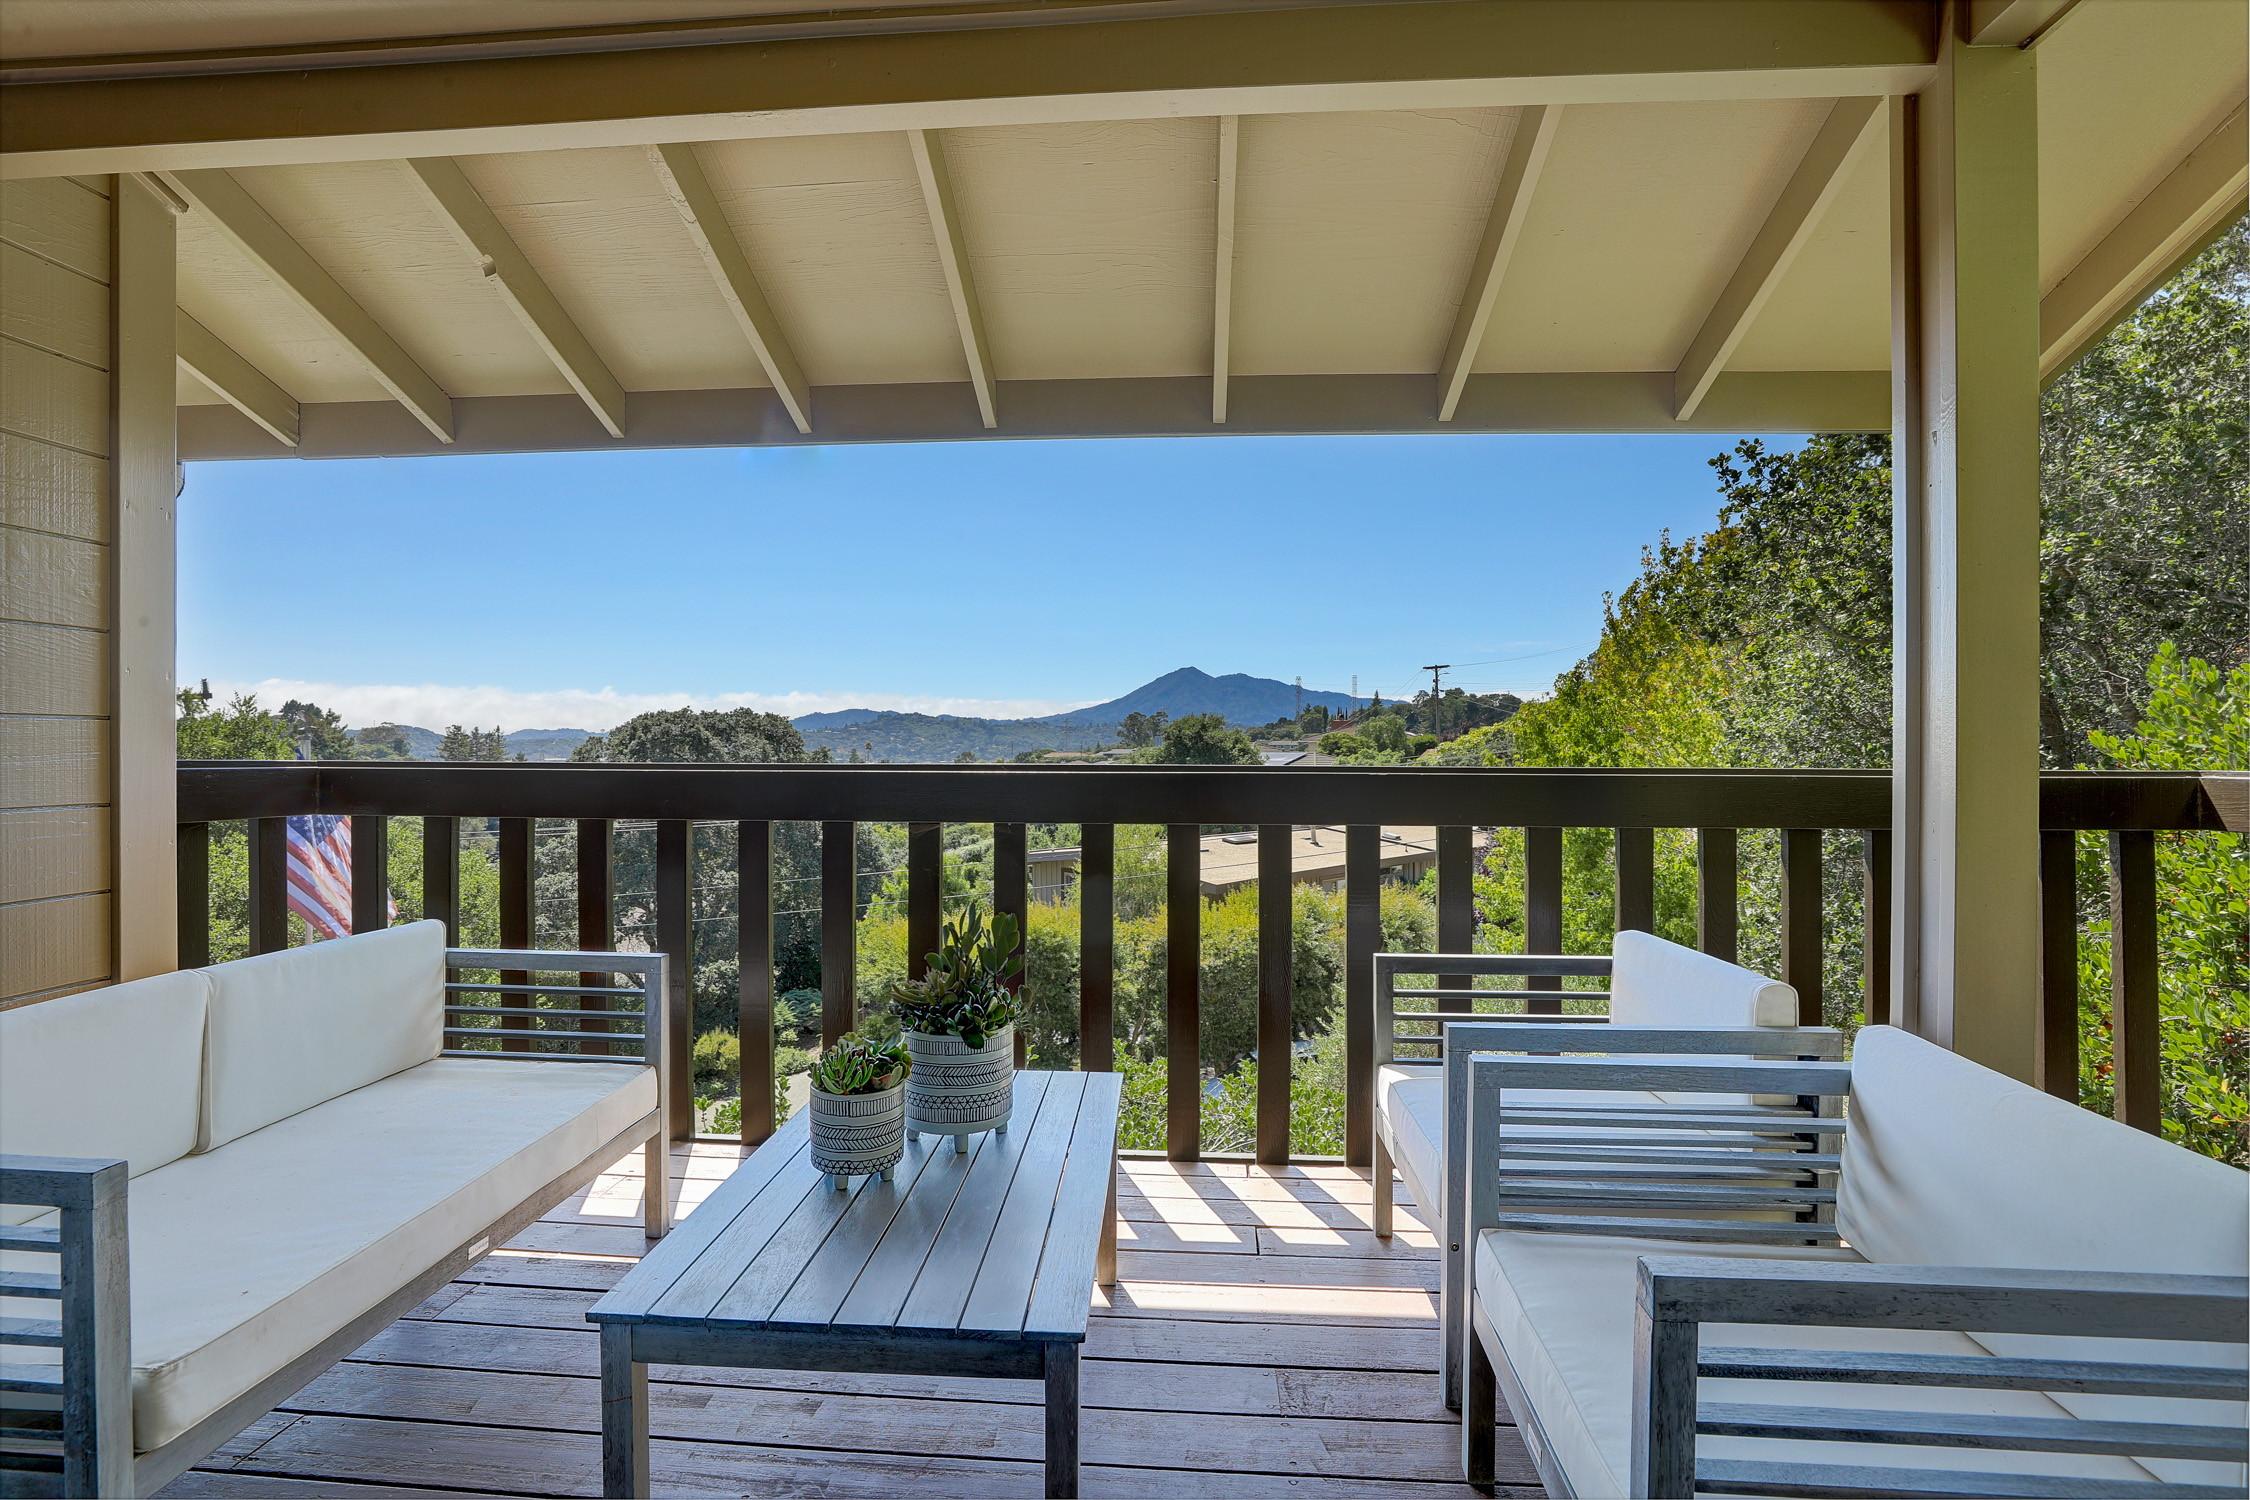 16Dorian 44 MLSSan Rafael Real Estate - Listed by Julia Fitzpatrick + Allie Fornesi Team Own Marin County .jpg